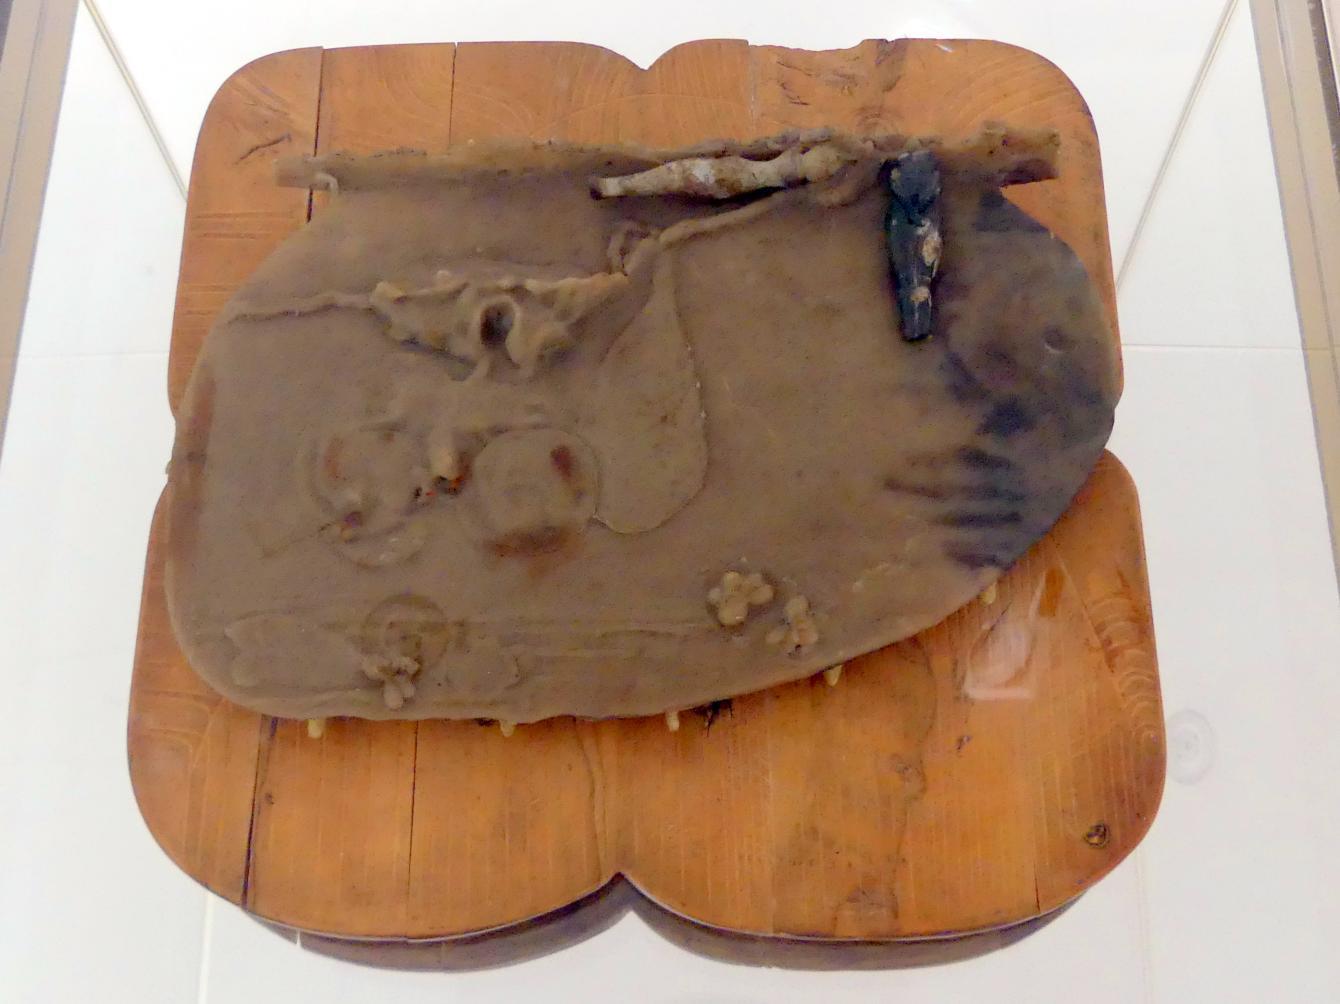 Joseph Beuys: Bienenkönigin I, 1947 - 1952